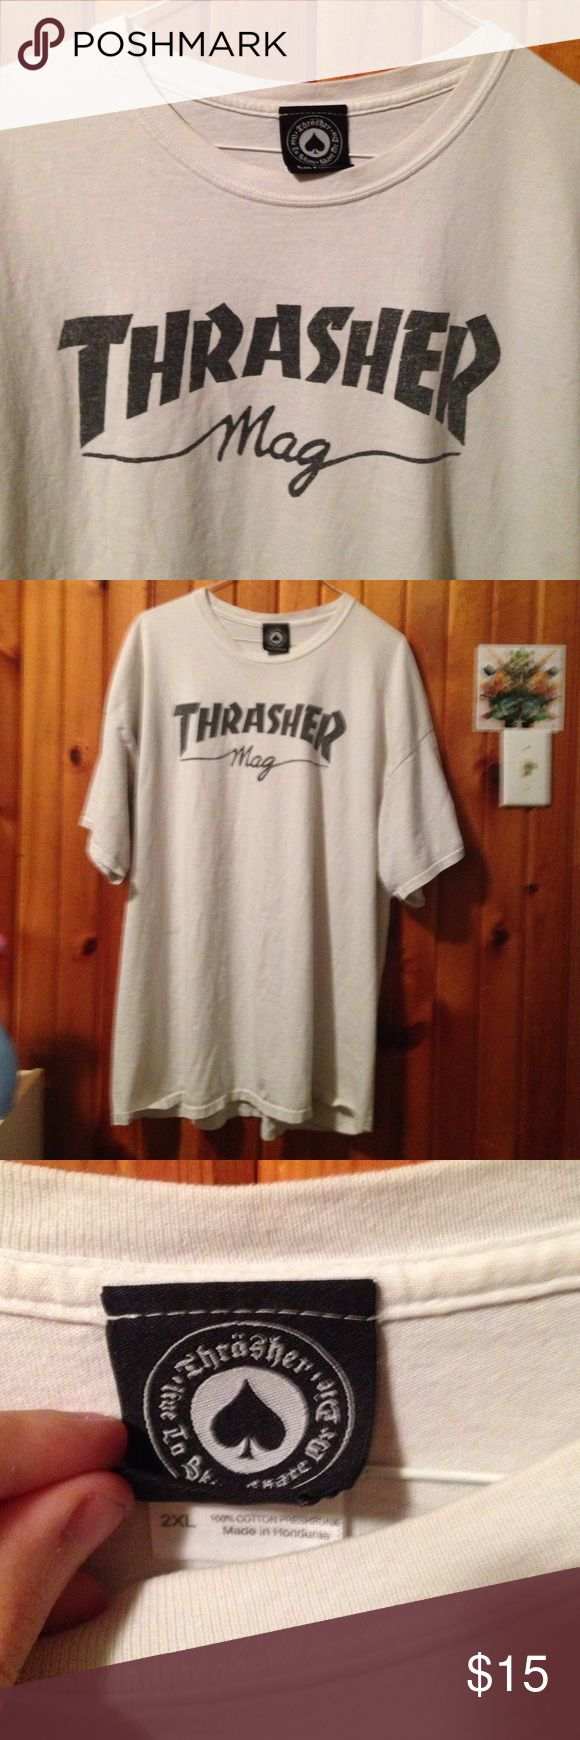 Thrasher mag t-shirt sz XXL Size 2XL Thrasher mag shirt, good condition Thrasher Magazine Shirts Tees - Short Sleeve